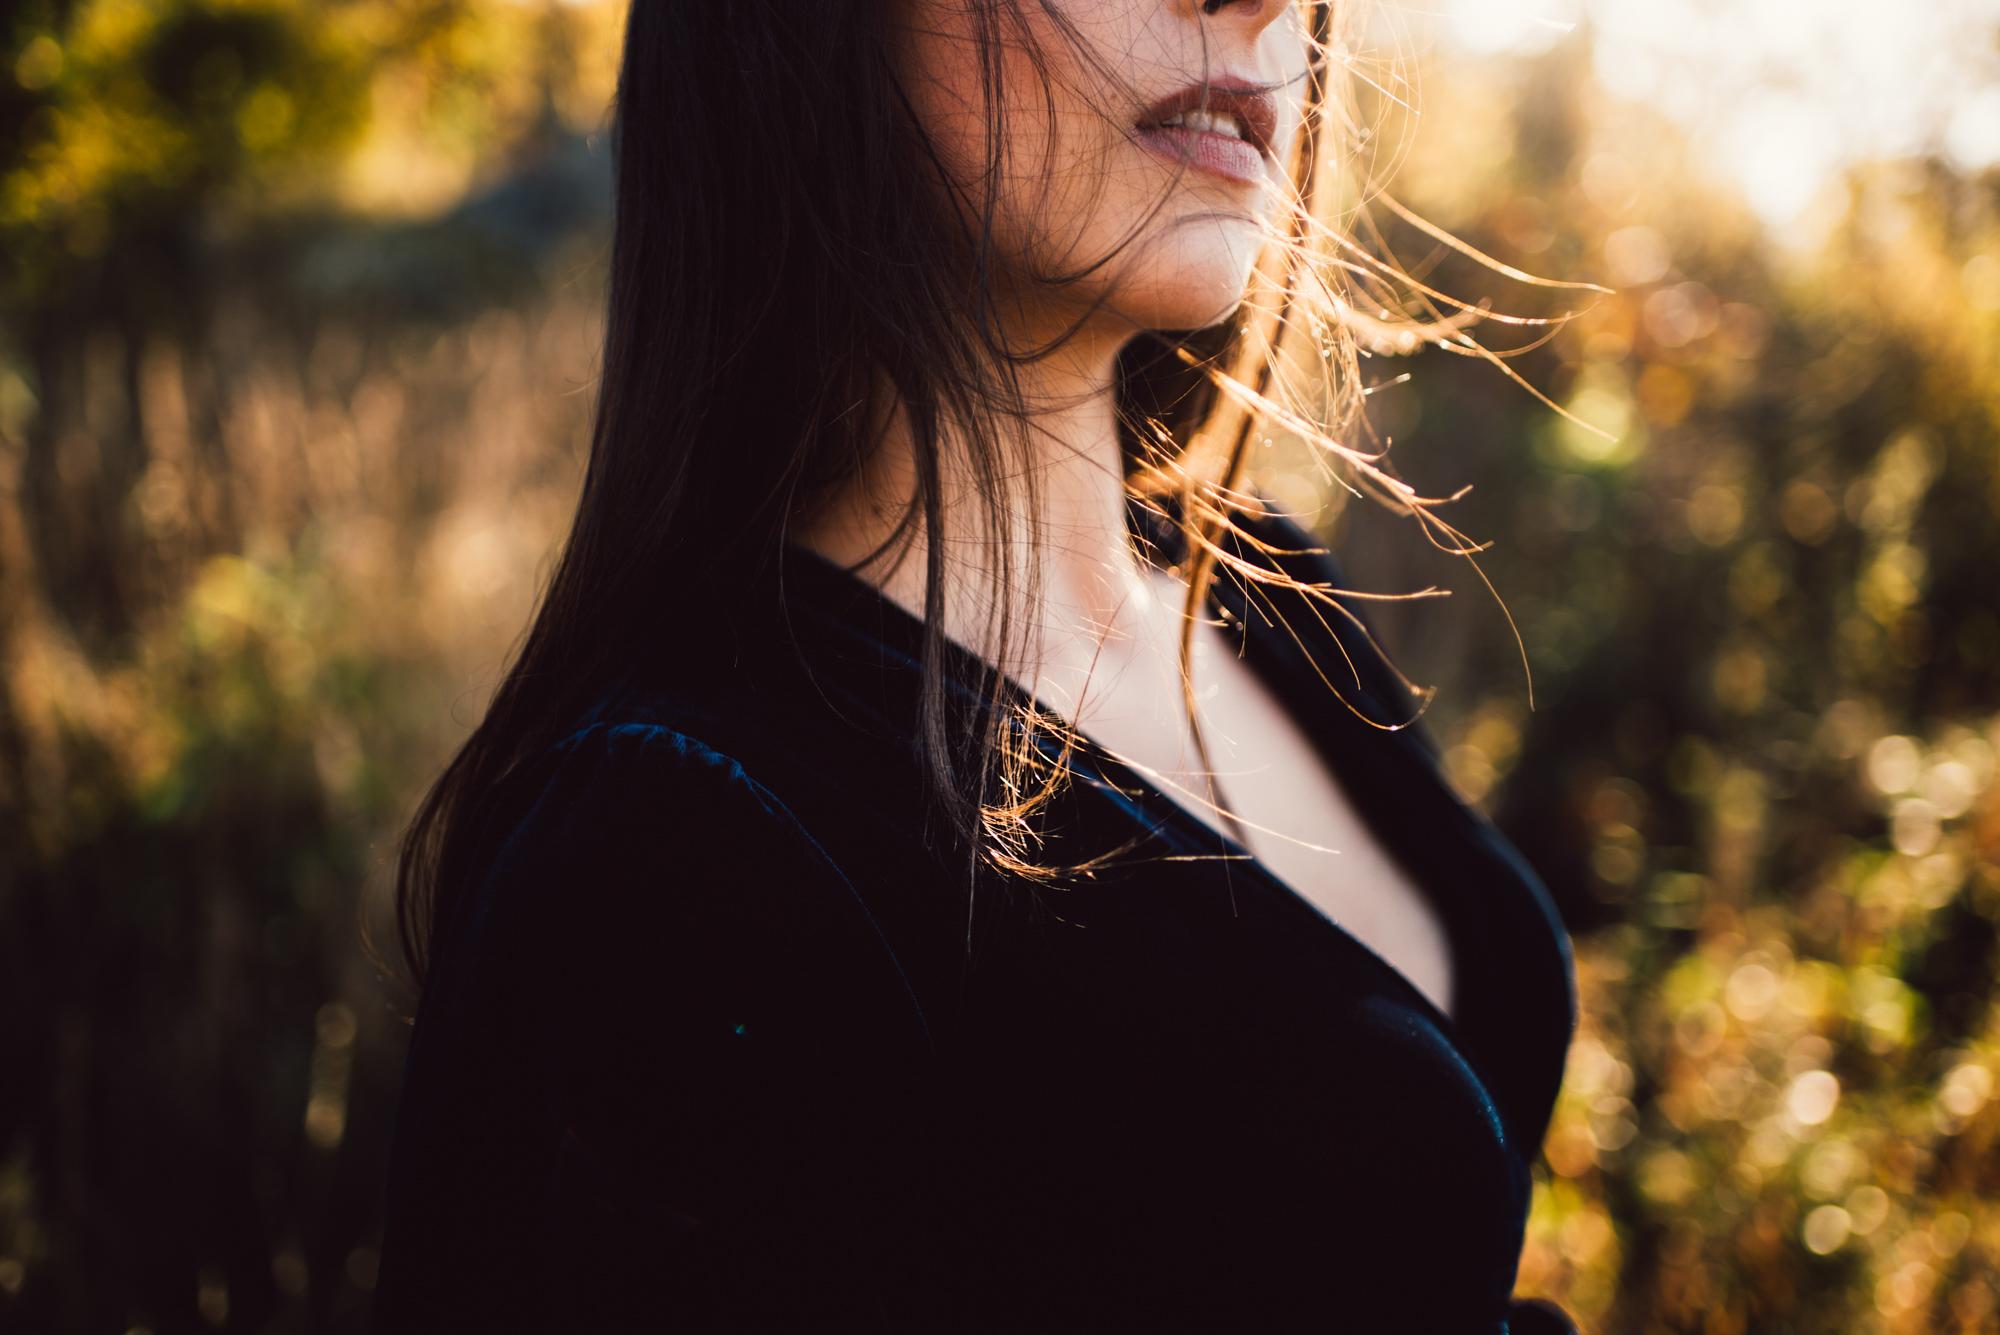 Megan_Shenandoah_National_Park_Windy_Romantic_Portraits_47_1.JPG